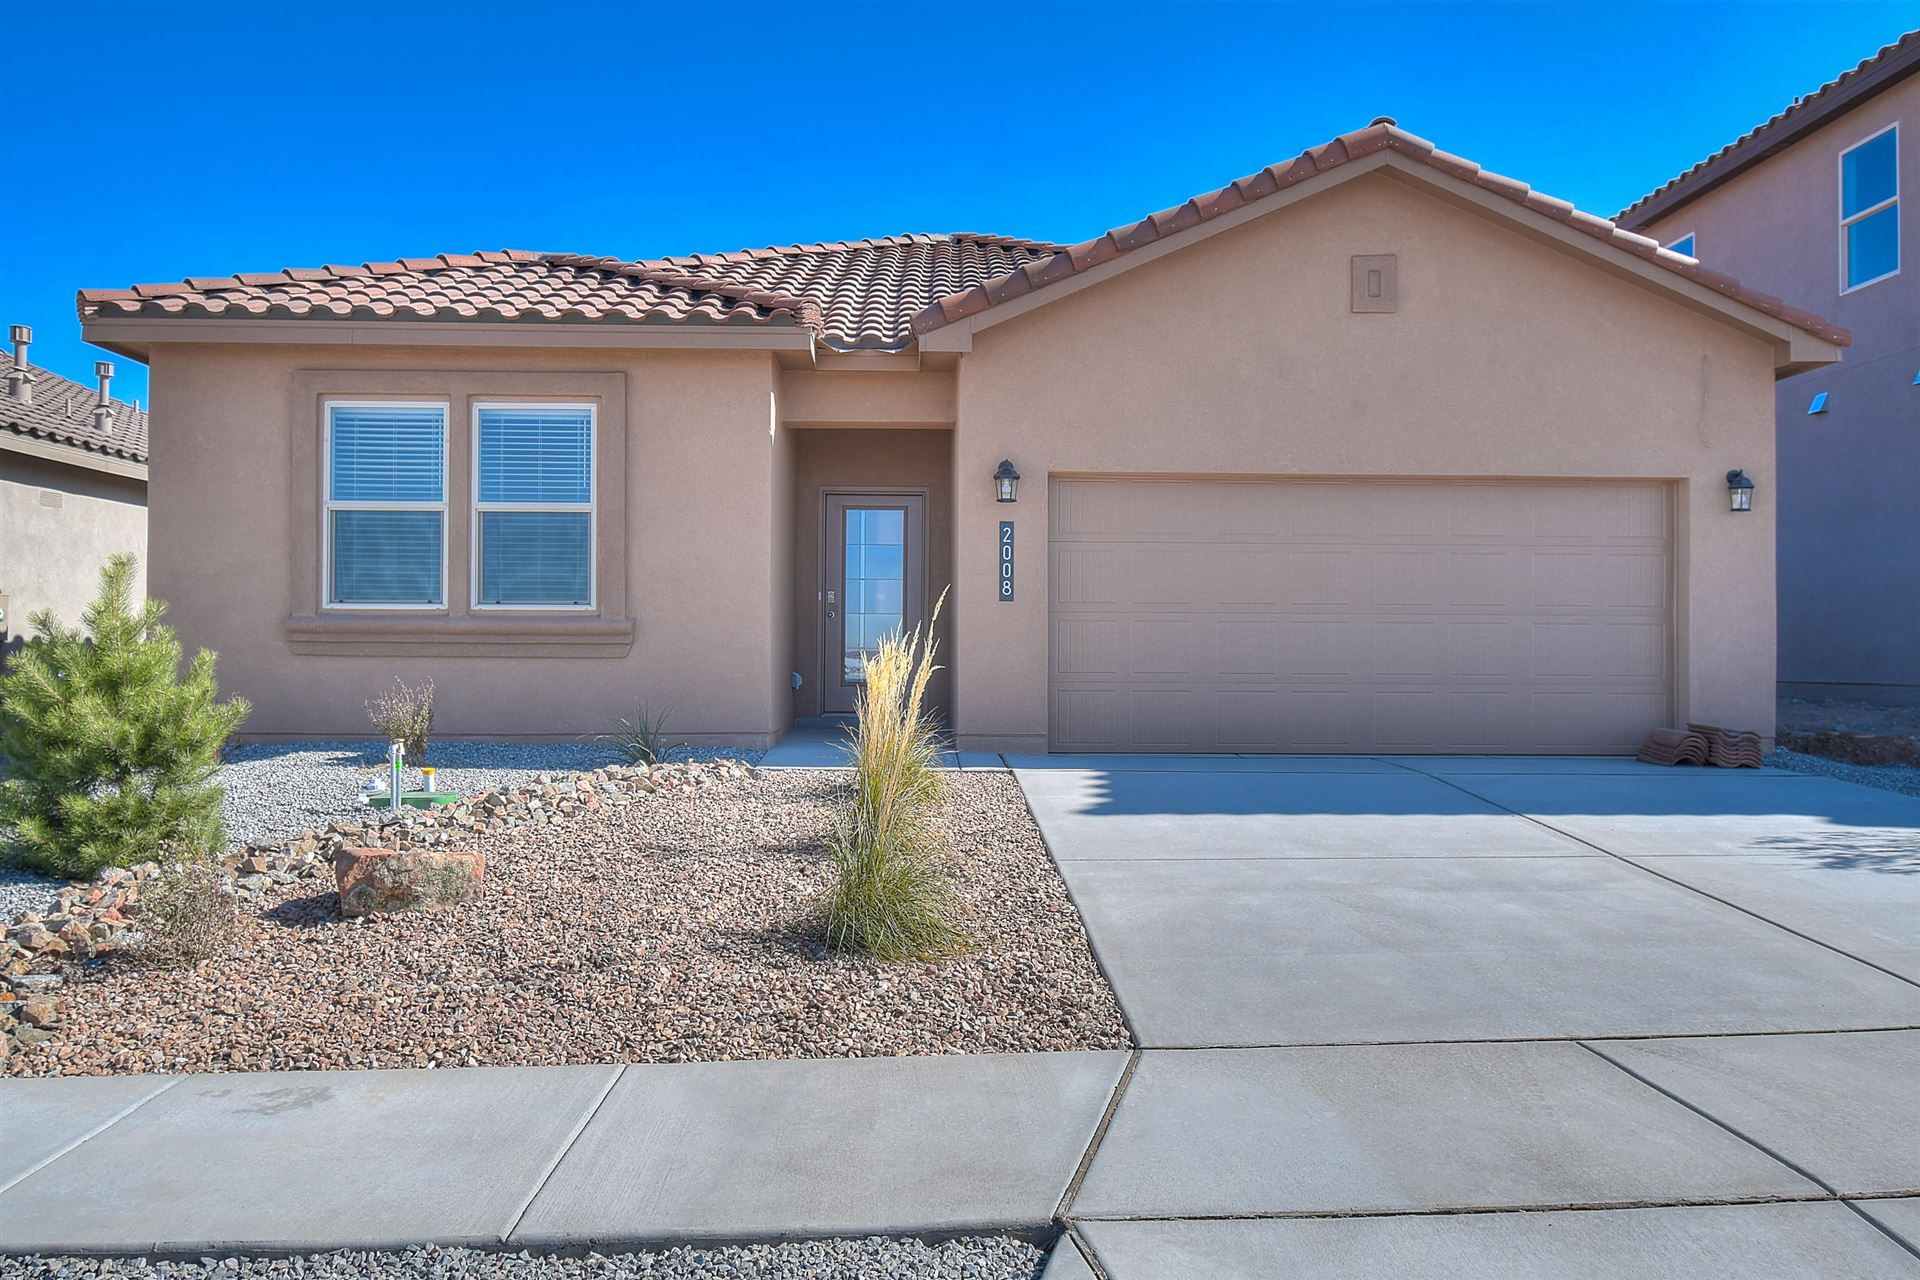 1913 SILVER DOLLAR Street SE, Albuquerque, NM 87123 - MLS#: 984662